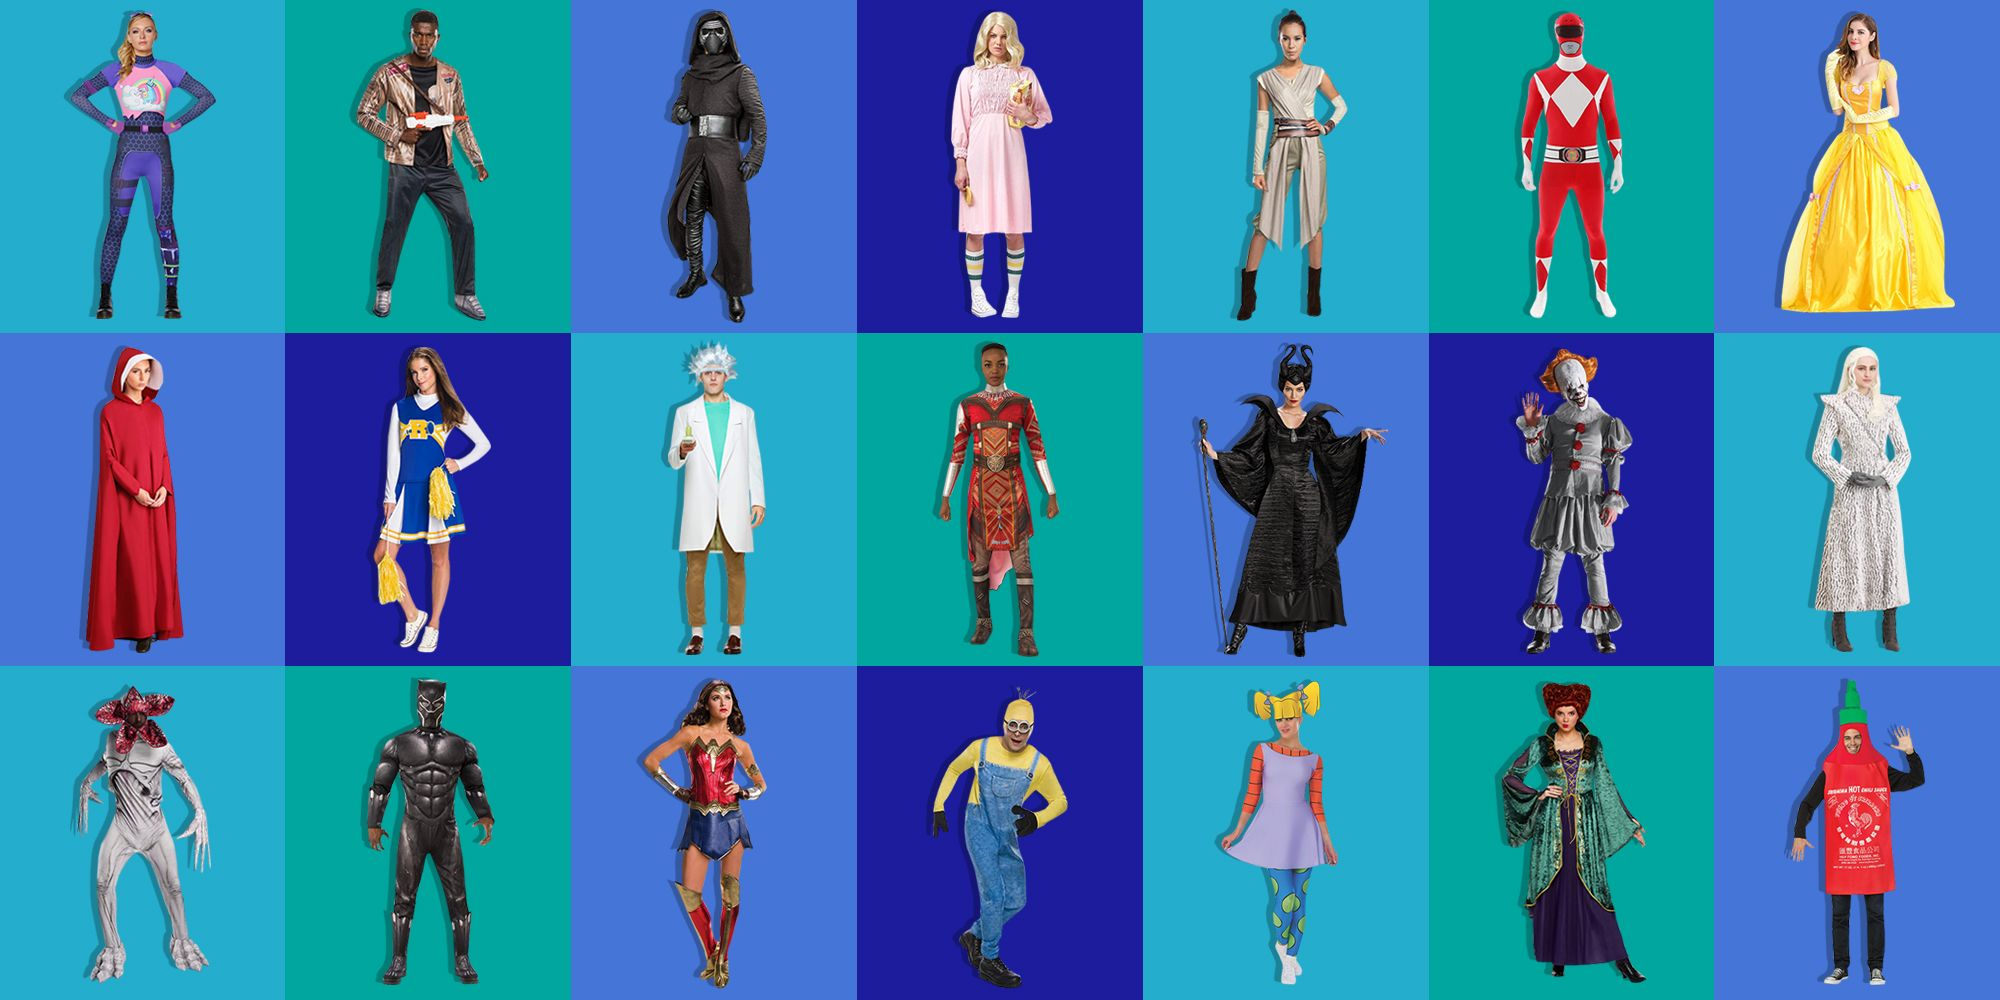 Halloween 2020 Characters 40 Best Halloween Costumes of 2020   Halloween Costume Ideas for